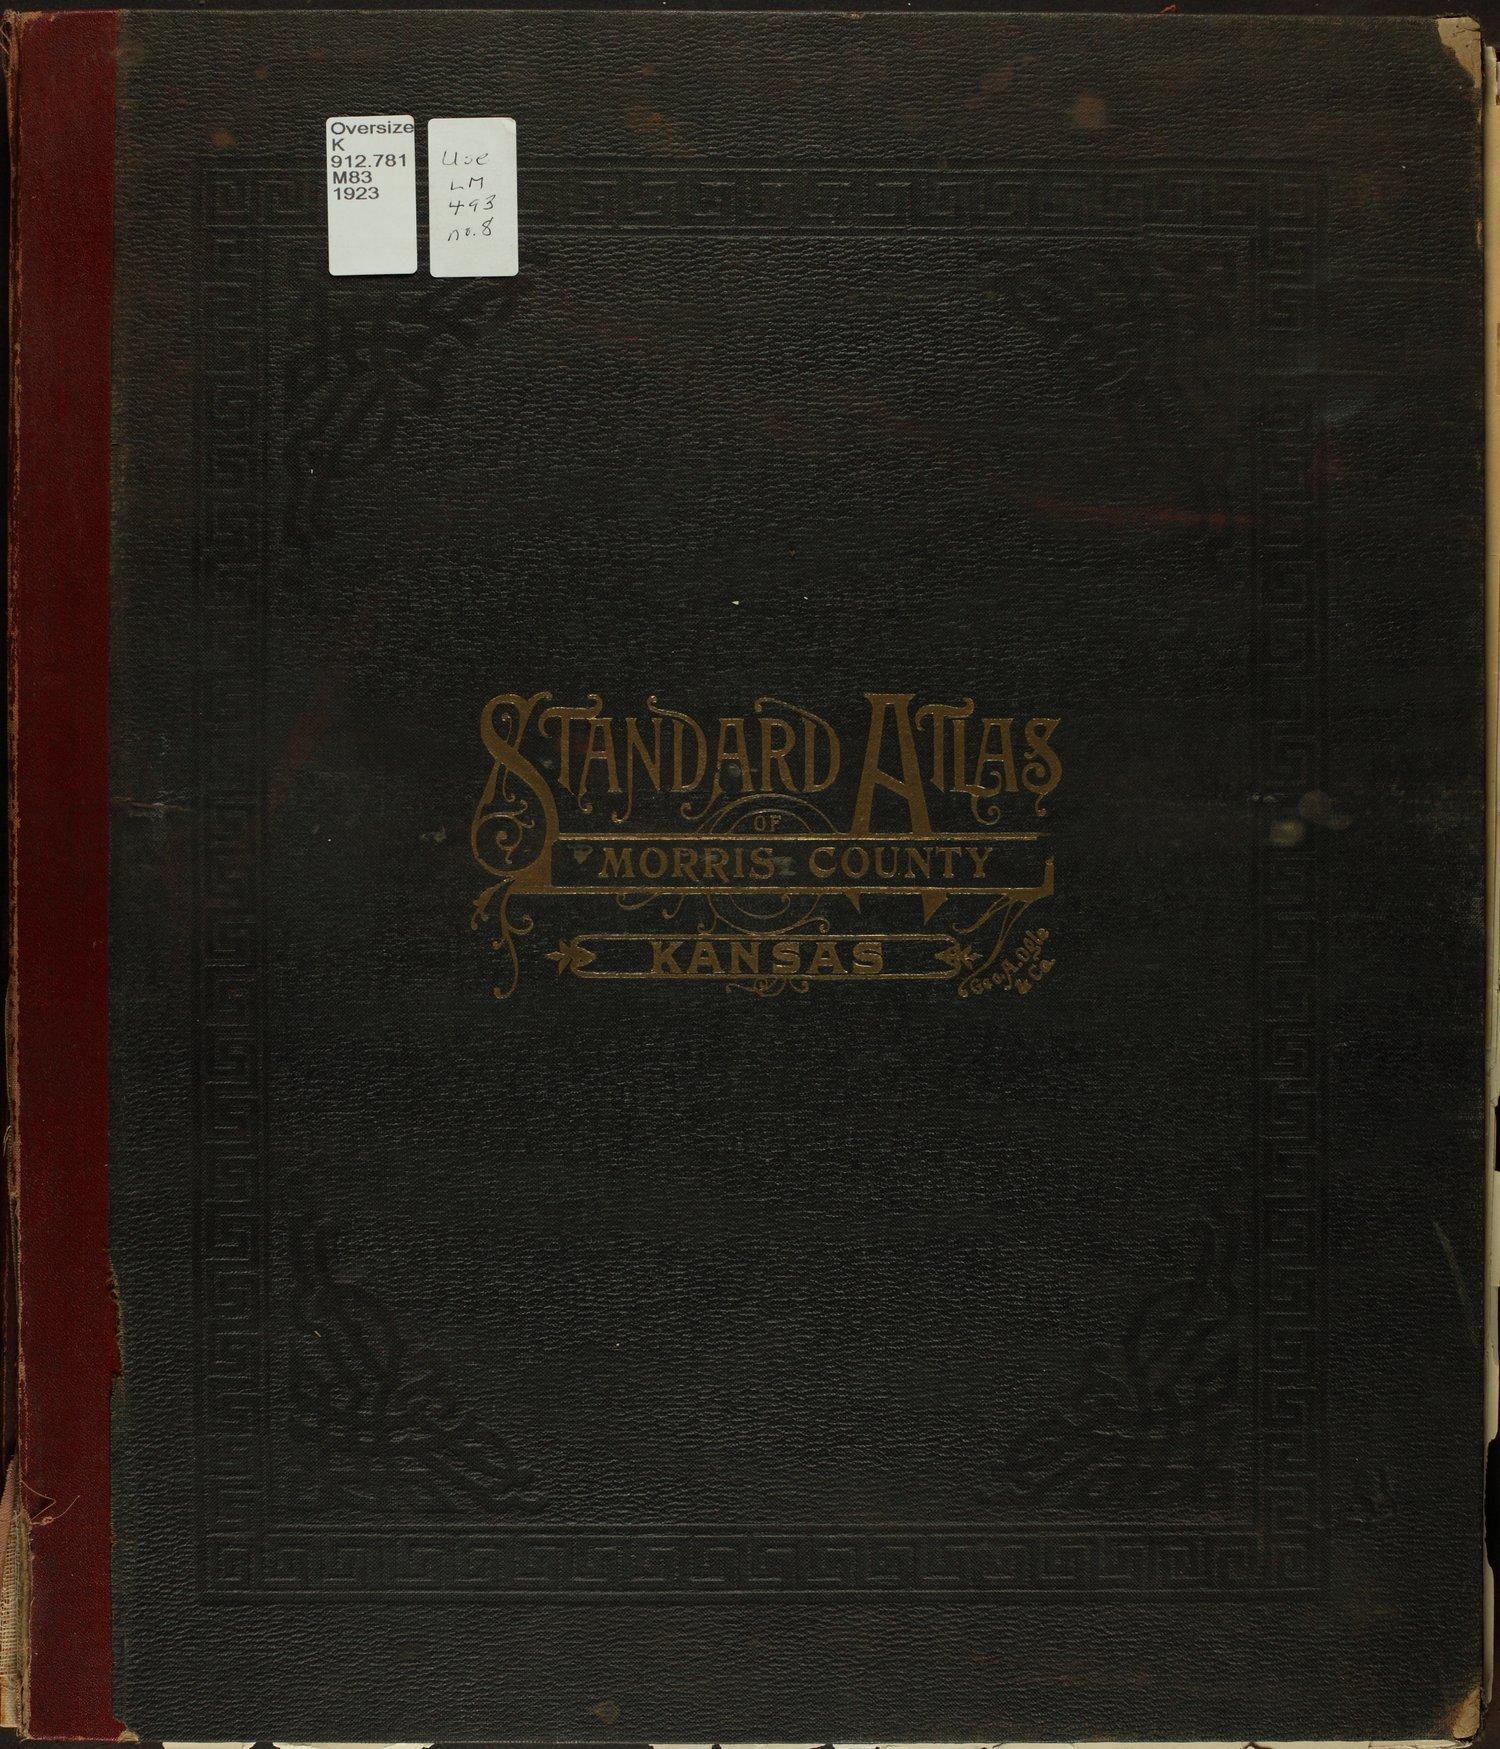 Standard atlas of Morris County, Kansas - Front Cover